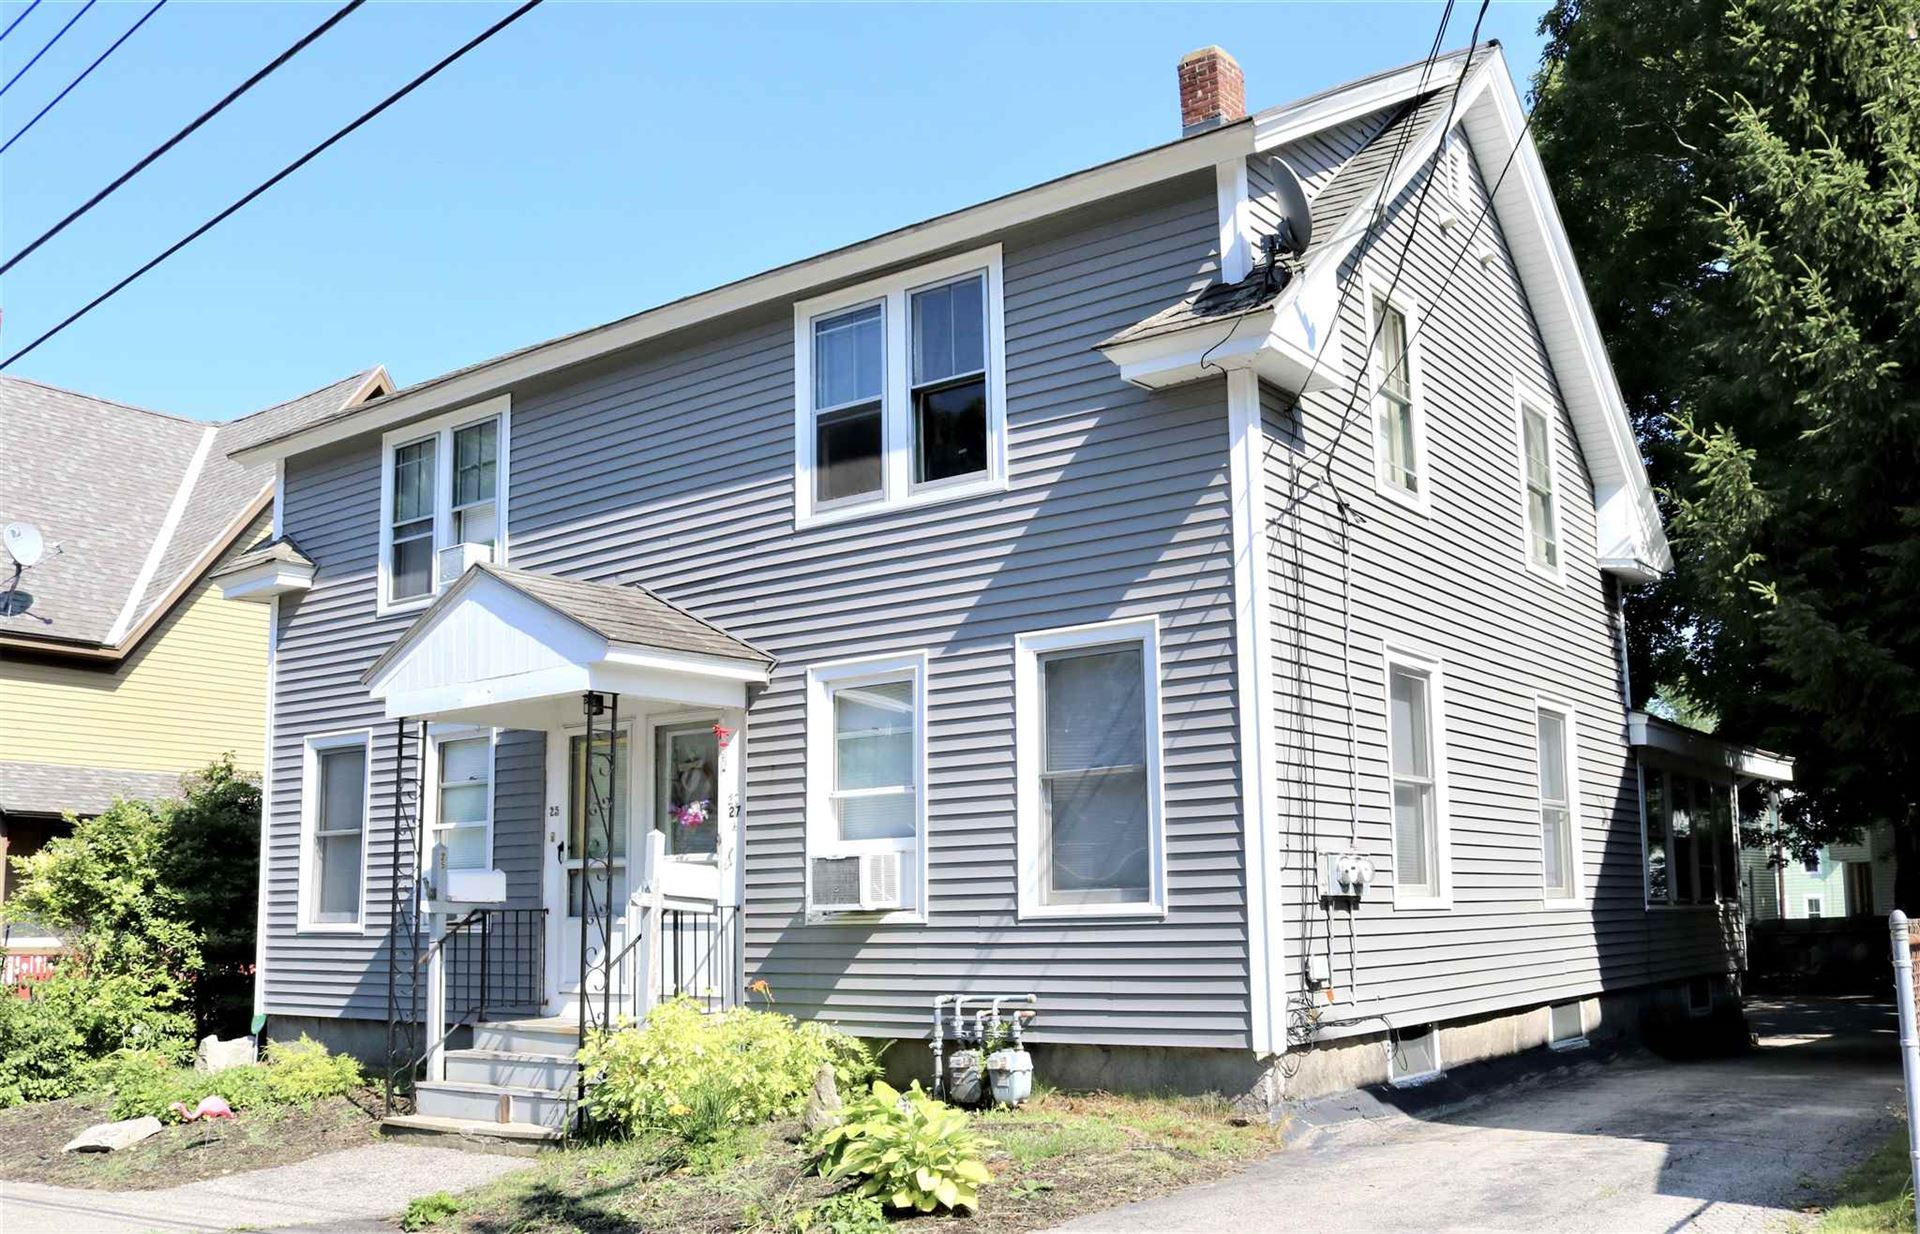 25-27 Perley Street, Concord, NH 03301 - #: 4815366